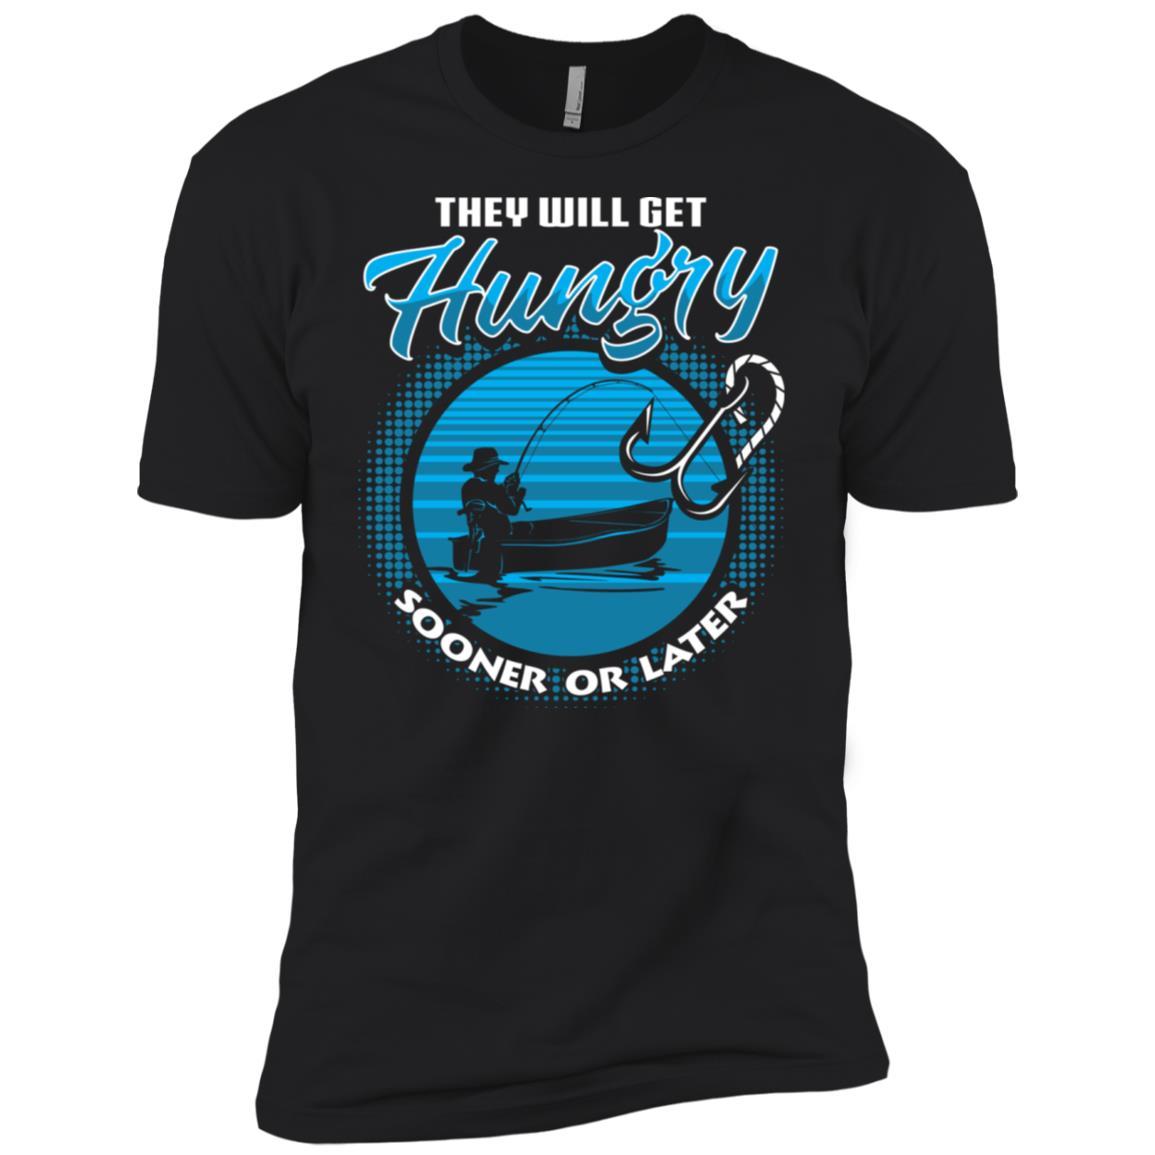 Funny Fishings for Men Women Kids Fisherman Men Short Sleeve T-Shirt